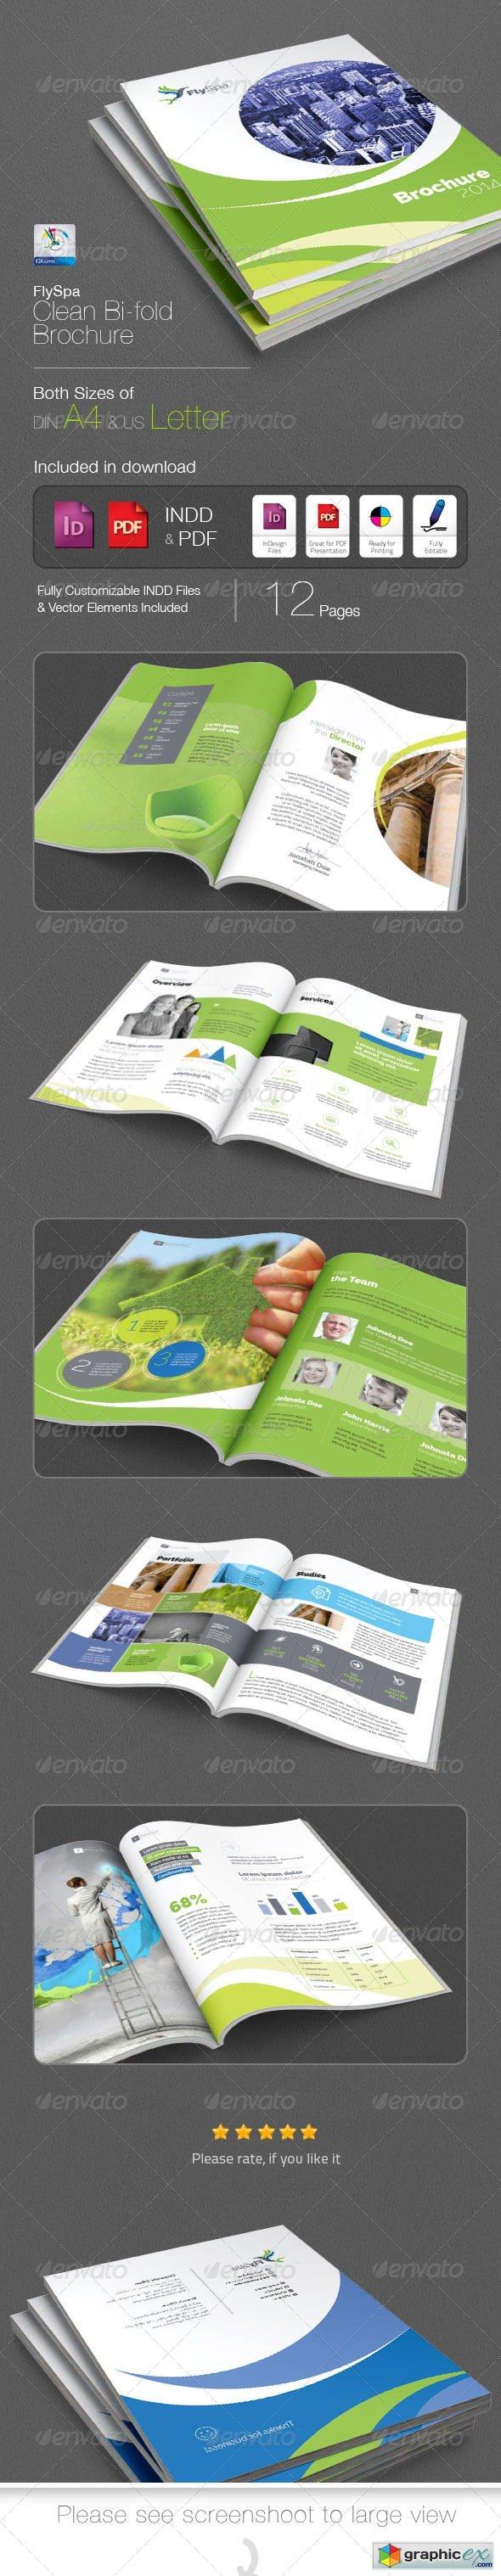 FlySpa Bi-fold Brochure